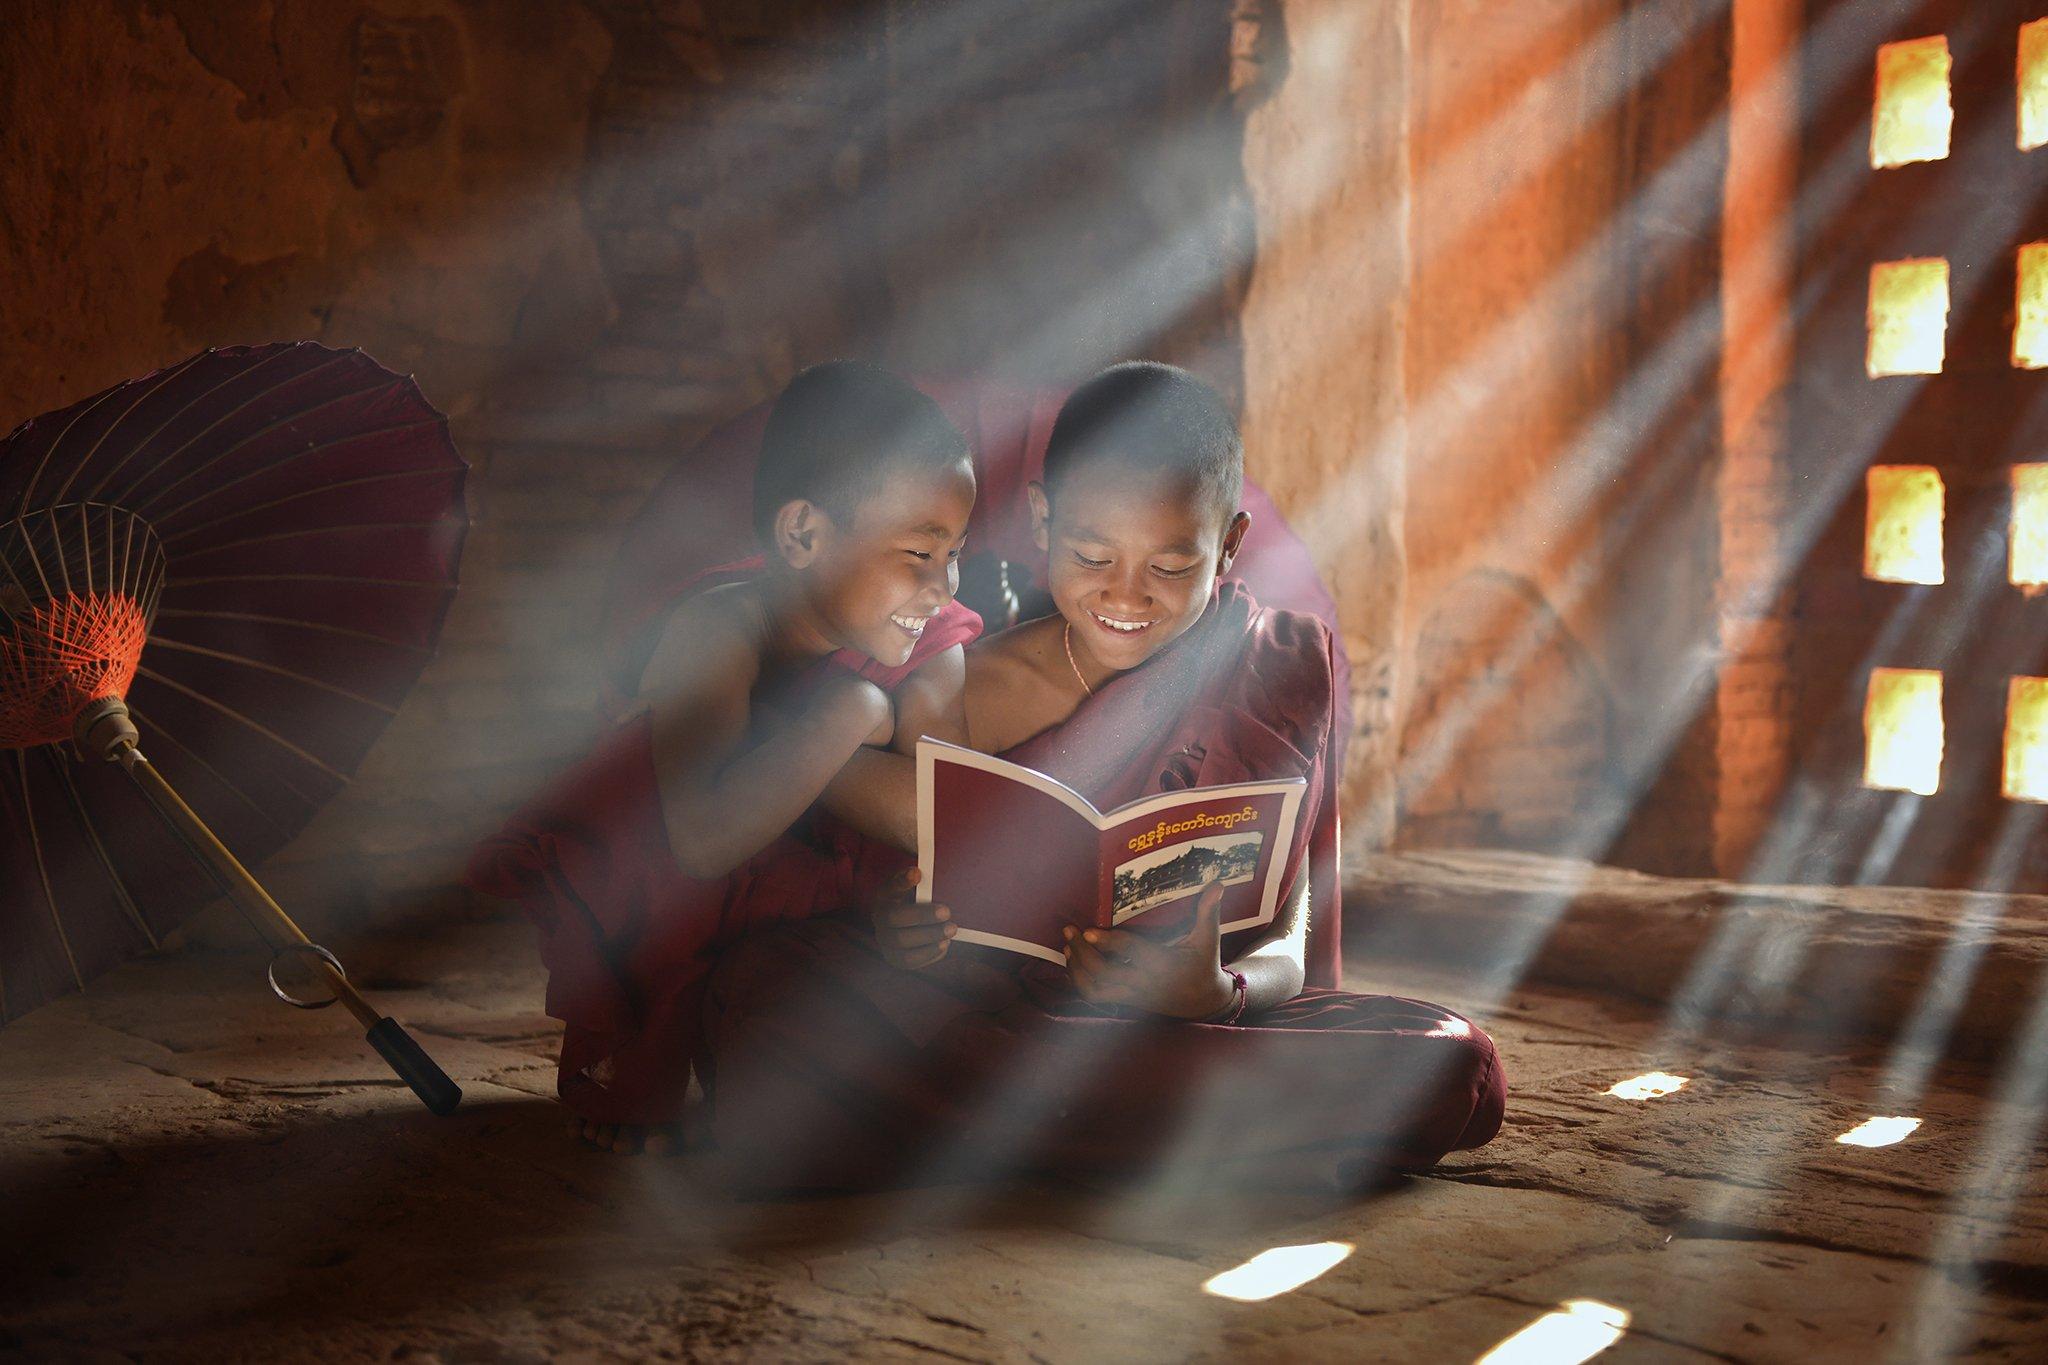 monk,asia,asian,bhudalist.bhudda,myanmar,burma,pray,reading,light,sunlight,raylight,happiness,madalay,travel,culture,jorney,, Saravut Whanset